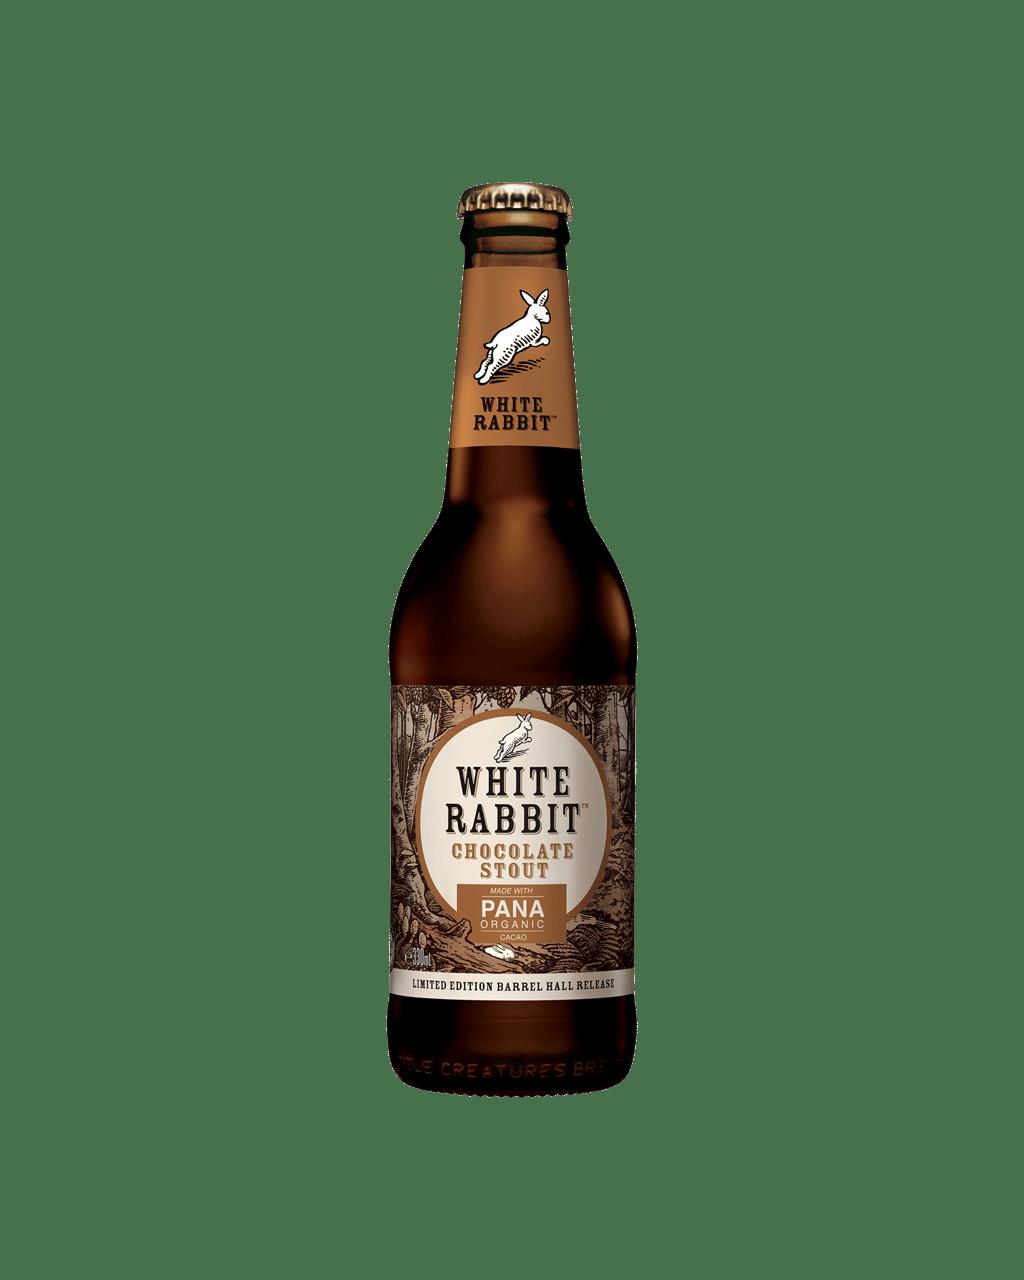 White Rabbit Chocolate Stout Bottle 330ml Dan Murphys Buy Wine